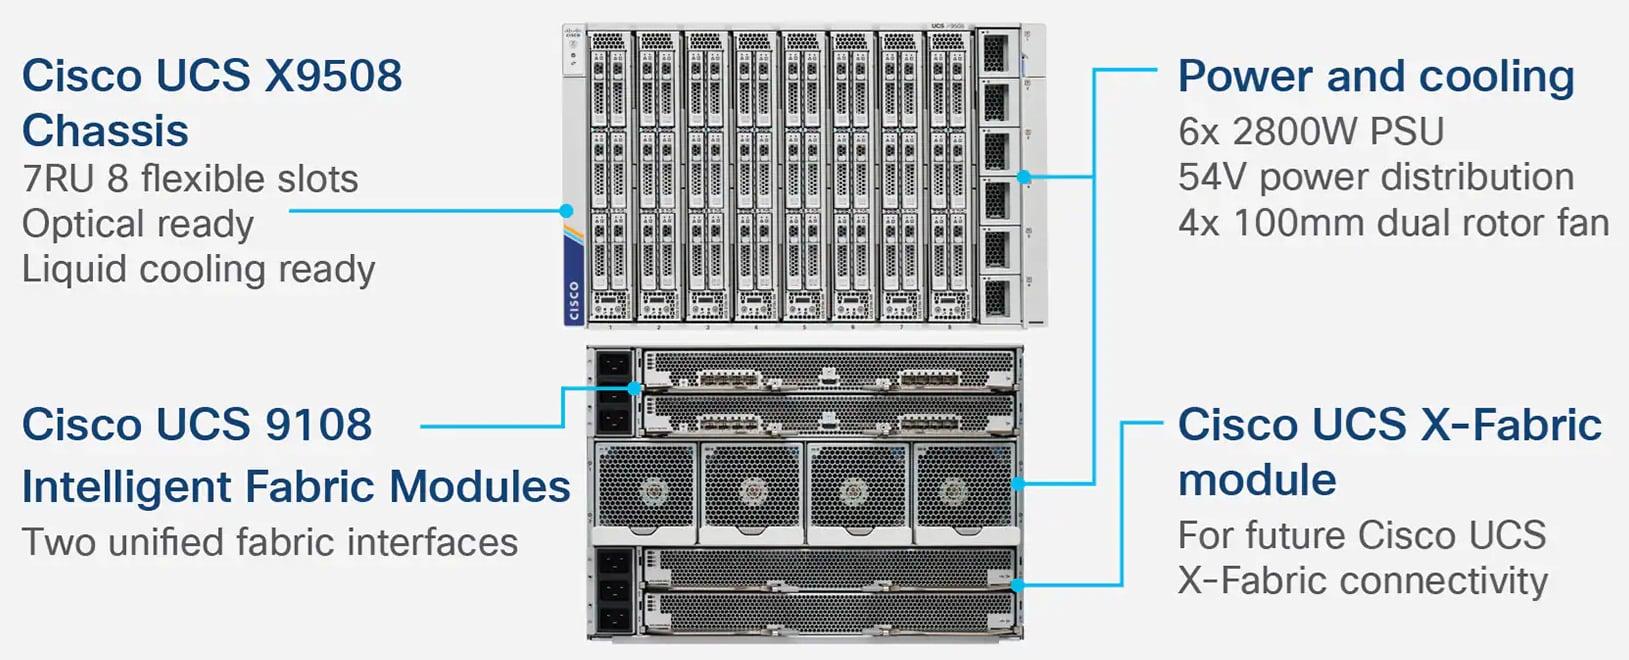 Cisco UCS X9508